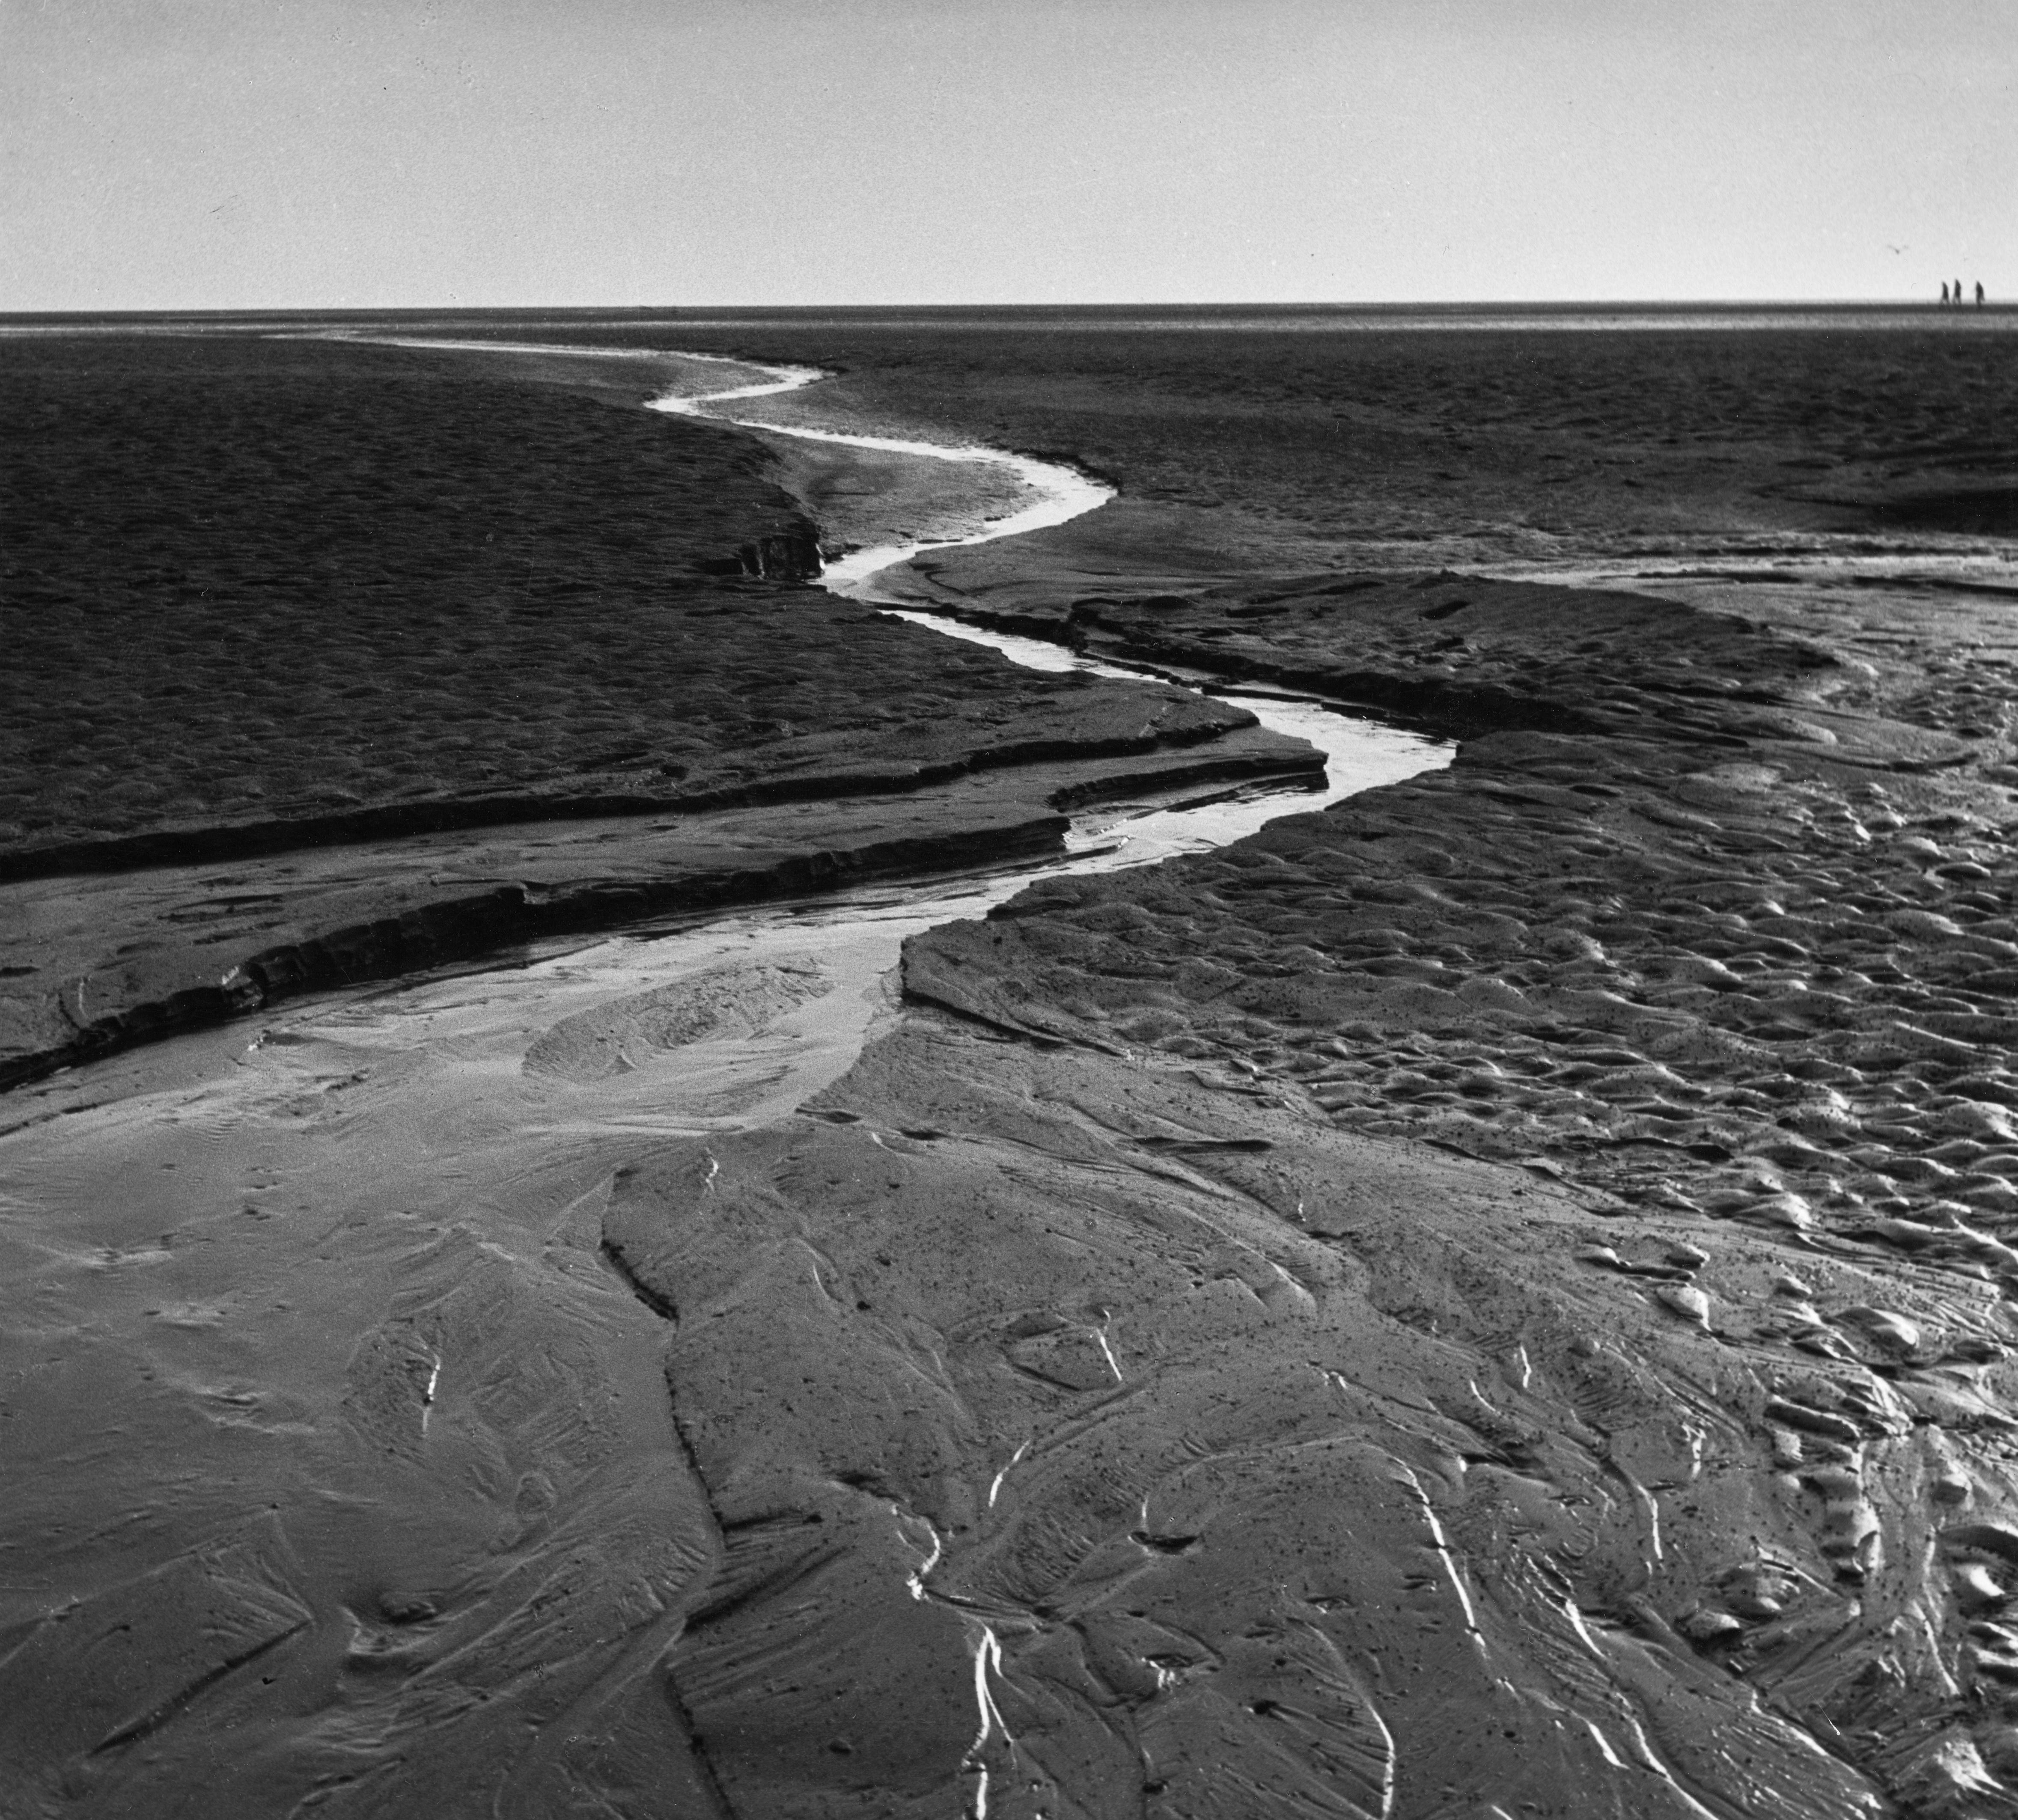 Alfred Ehrhardt: Watt-Fotografien der 1930er Jahre  - Sonderausstellung im UNESCO Weltnaturerbe Wattenmeer-Besucherzentrum Cuxhaven